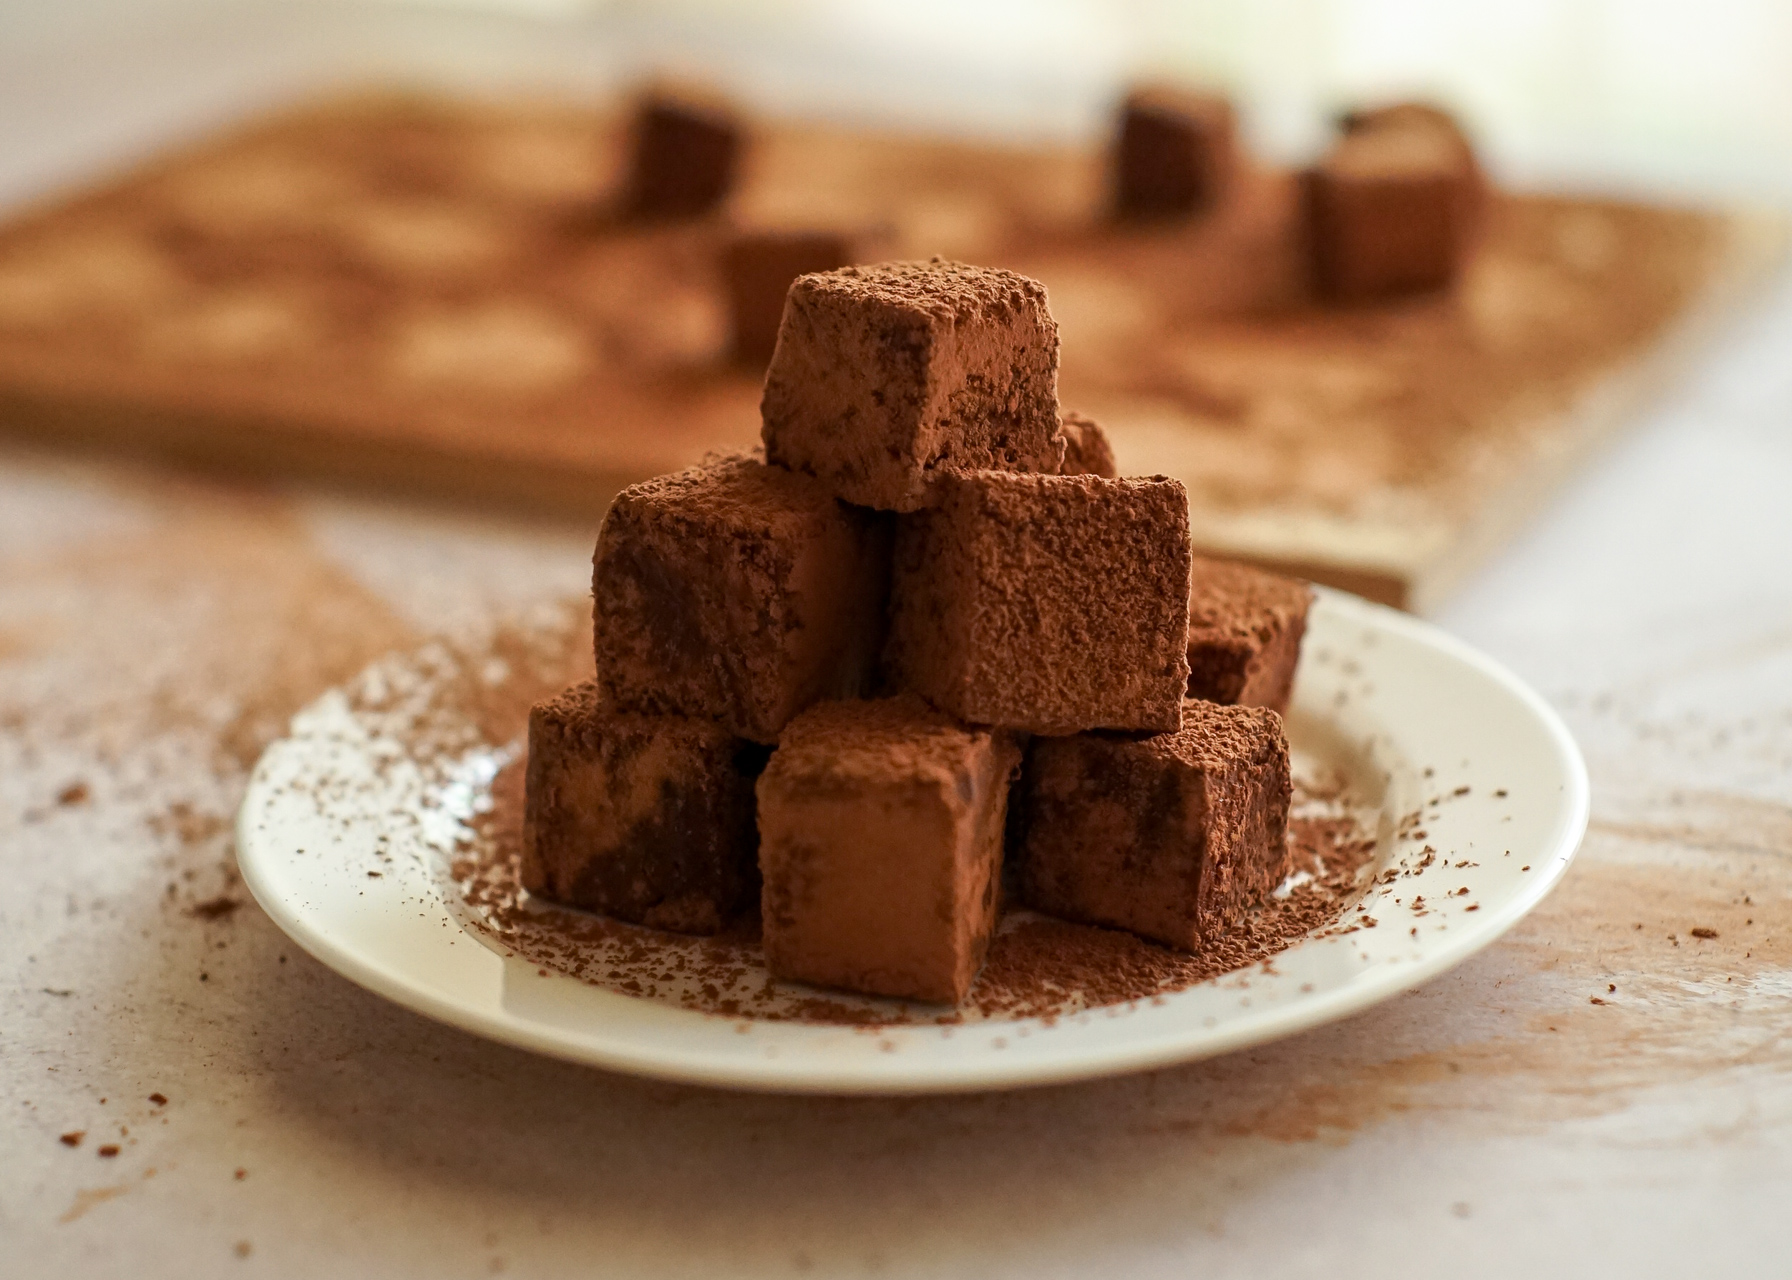 5 Easy Chocolate Dessert Recipes Anyone Can Make